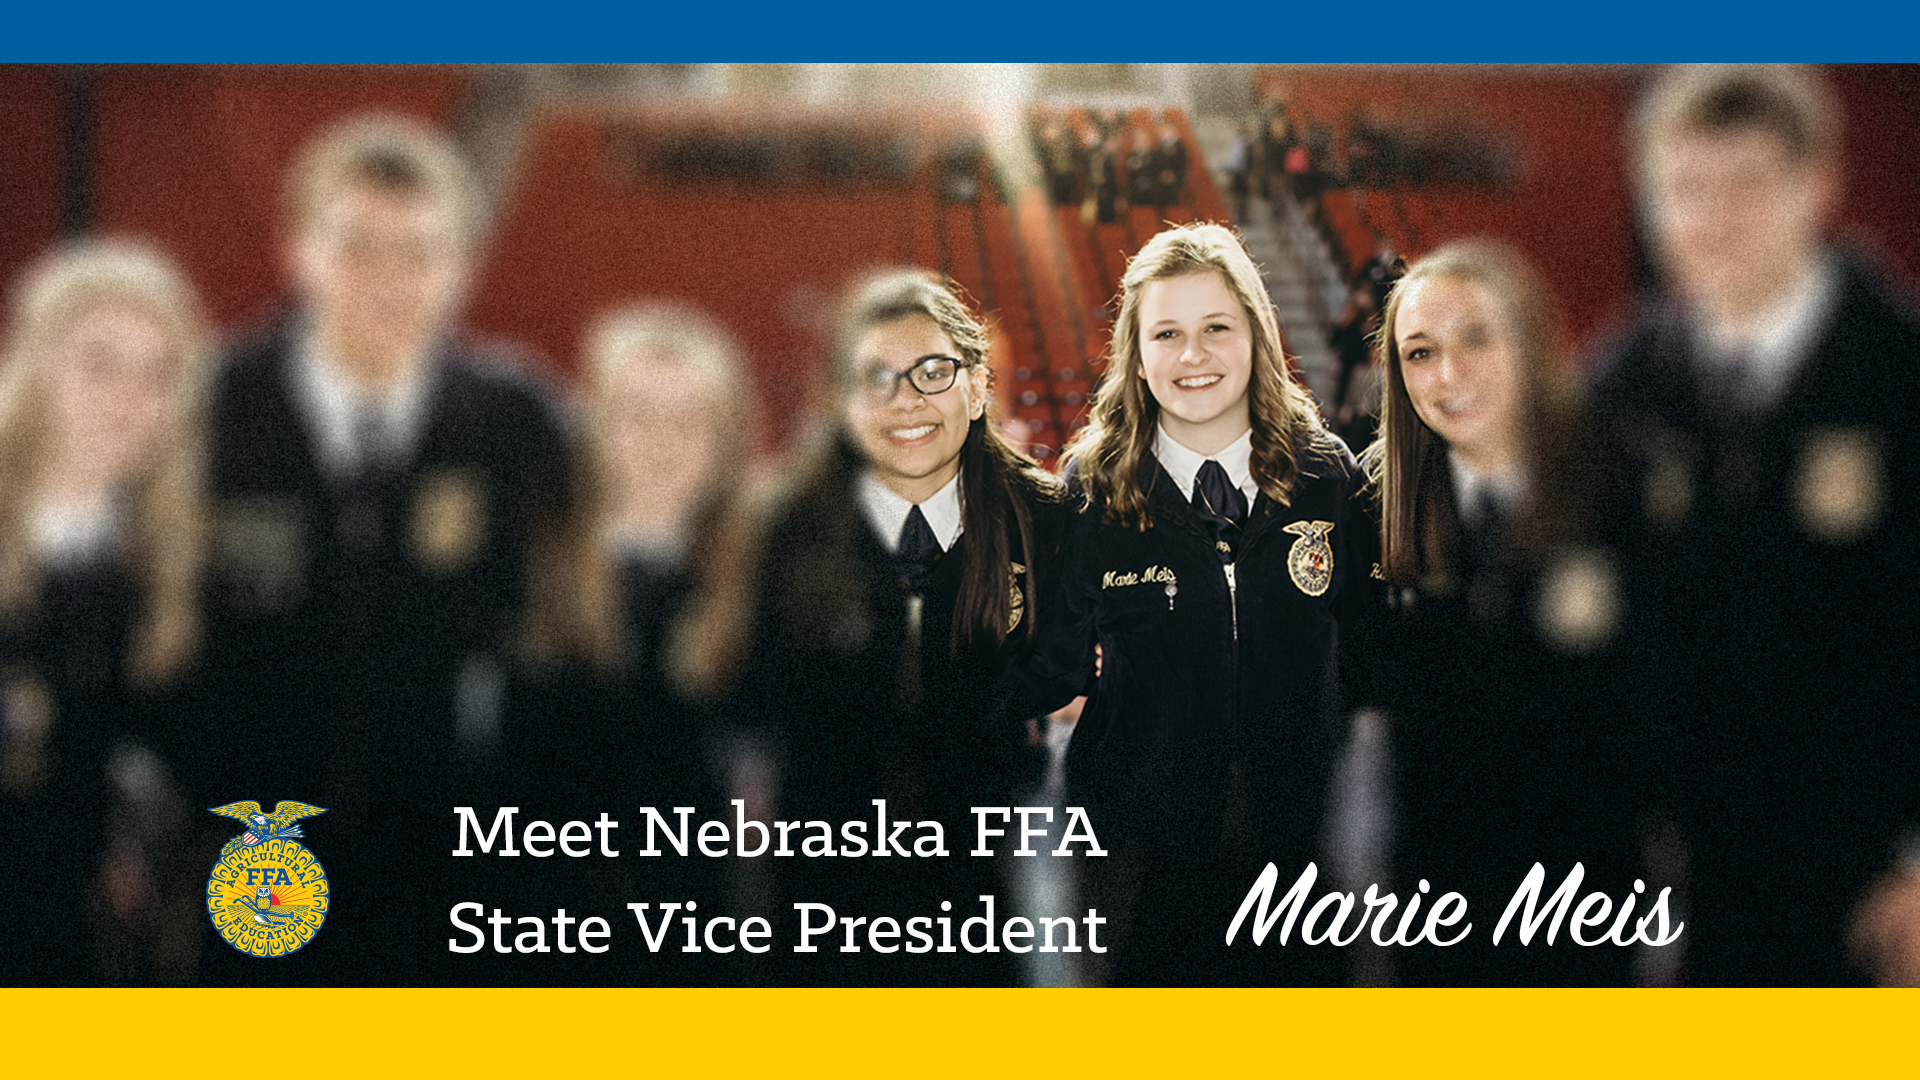 Meet Your 2018-19 Nebraska FFA Vice President: Marie Meis